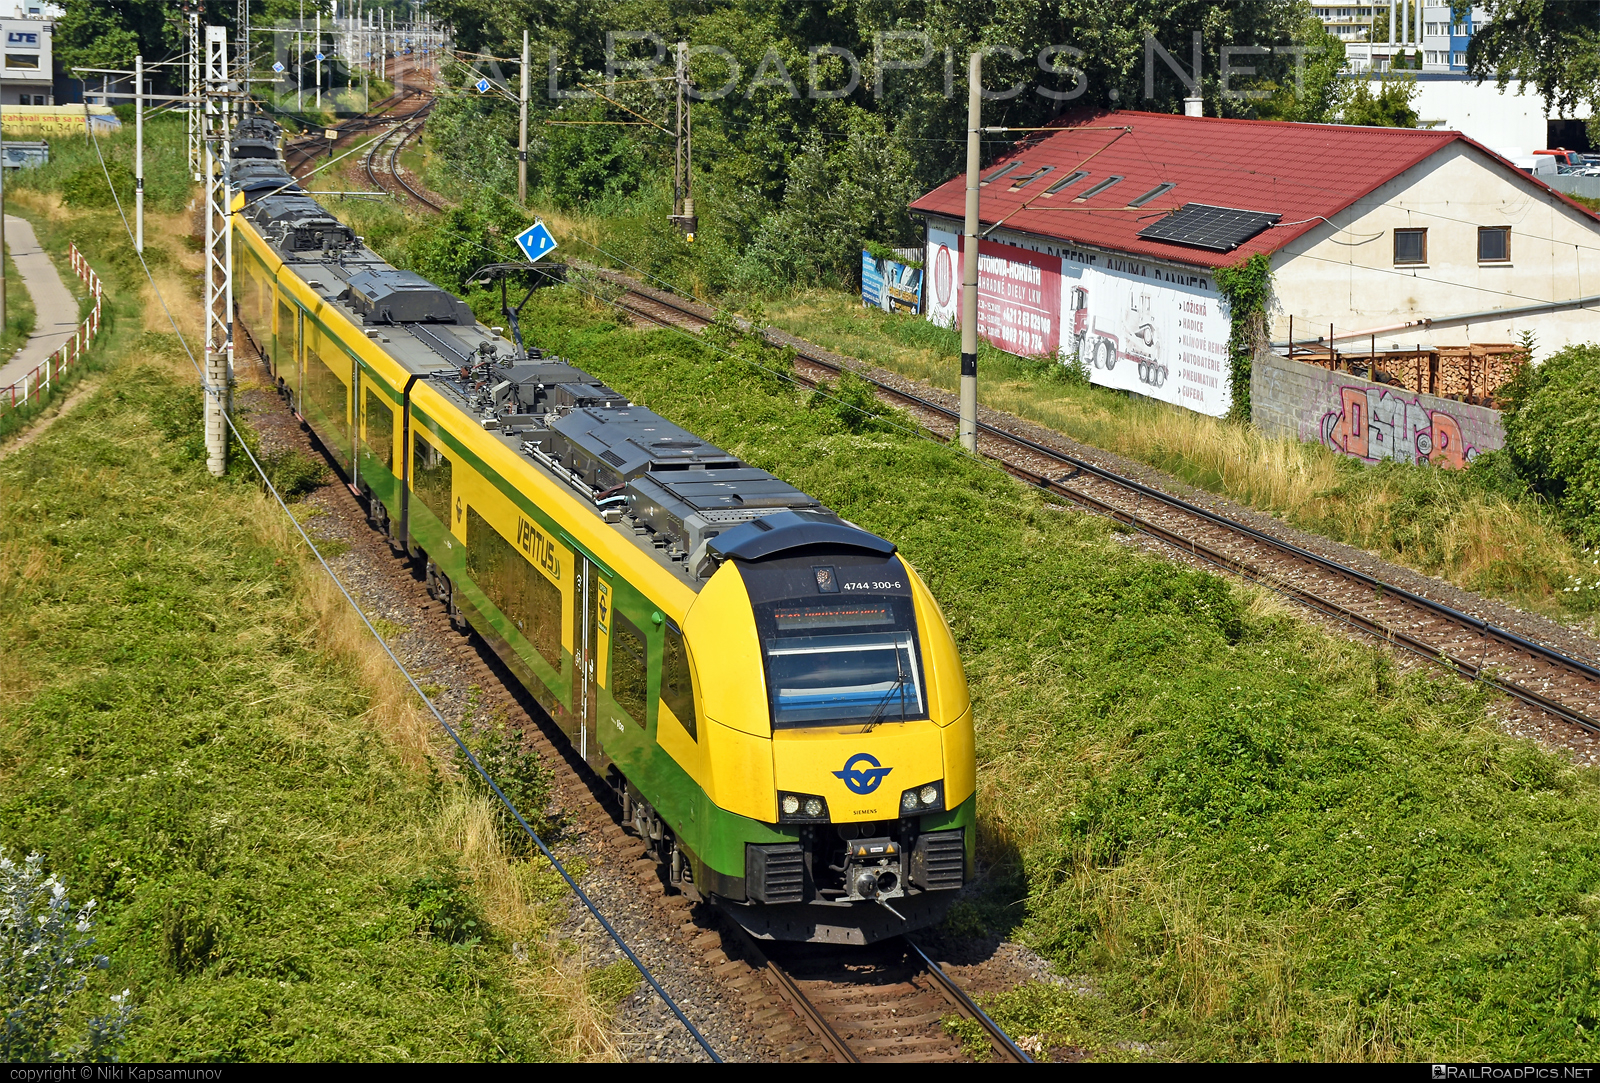 Siemens Desiro ML - 4744 300-6 operated by GYSEV - Györ-Sopron-Ebenfurti Vasut Részvénytarsasag #desiro #desiroml #gyorsopronebenfurtivasutreszvenytarsasag #gysev #raaboedenburgebenfurtereisenbahn #raaboedenburgebenfurtereisenbahnag #roeee #siemens #siemensdesiro #siemensdesiroml #ventus